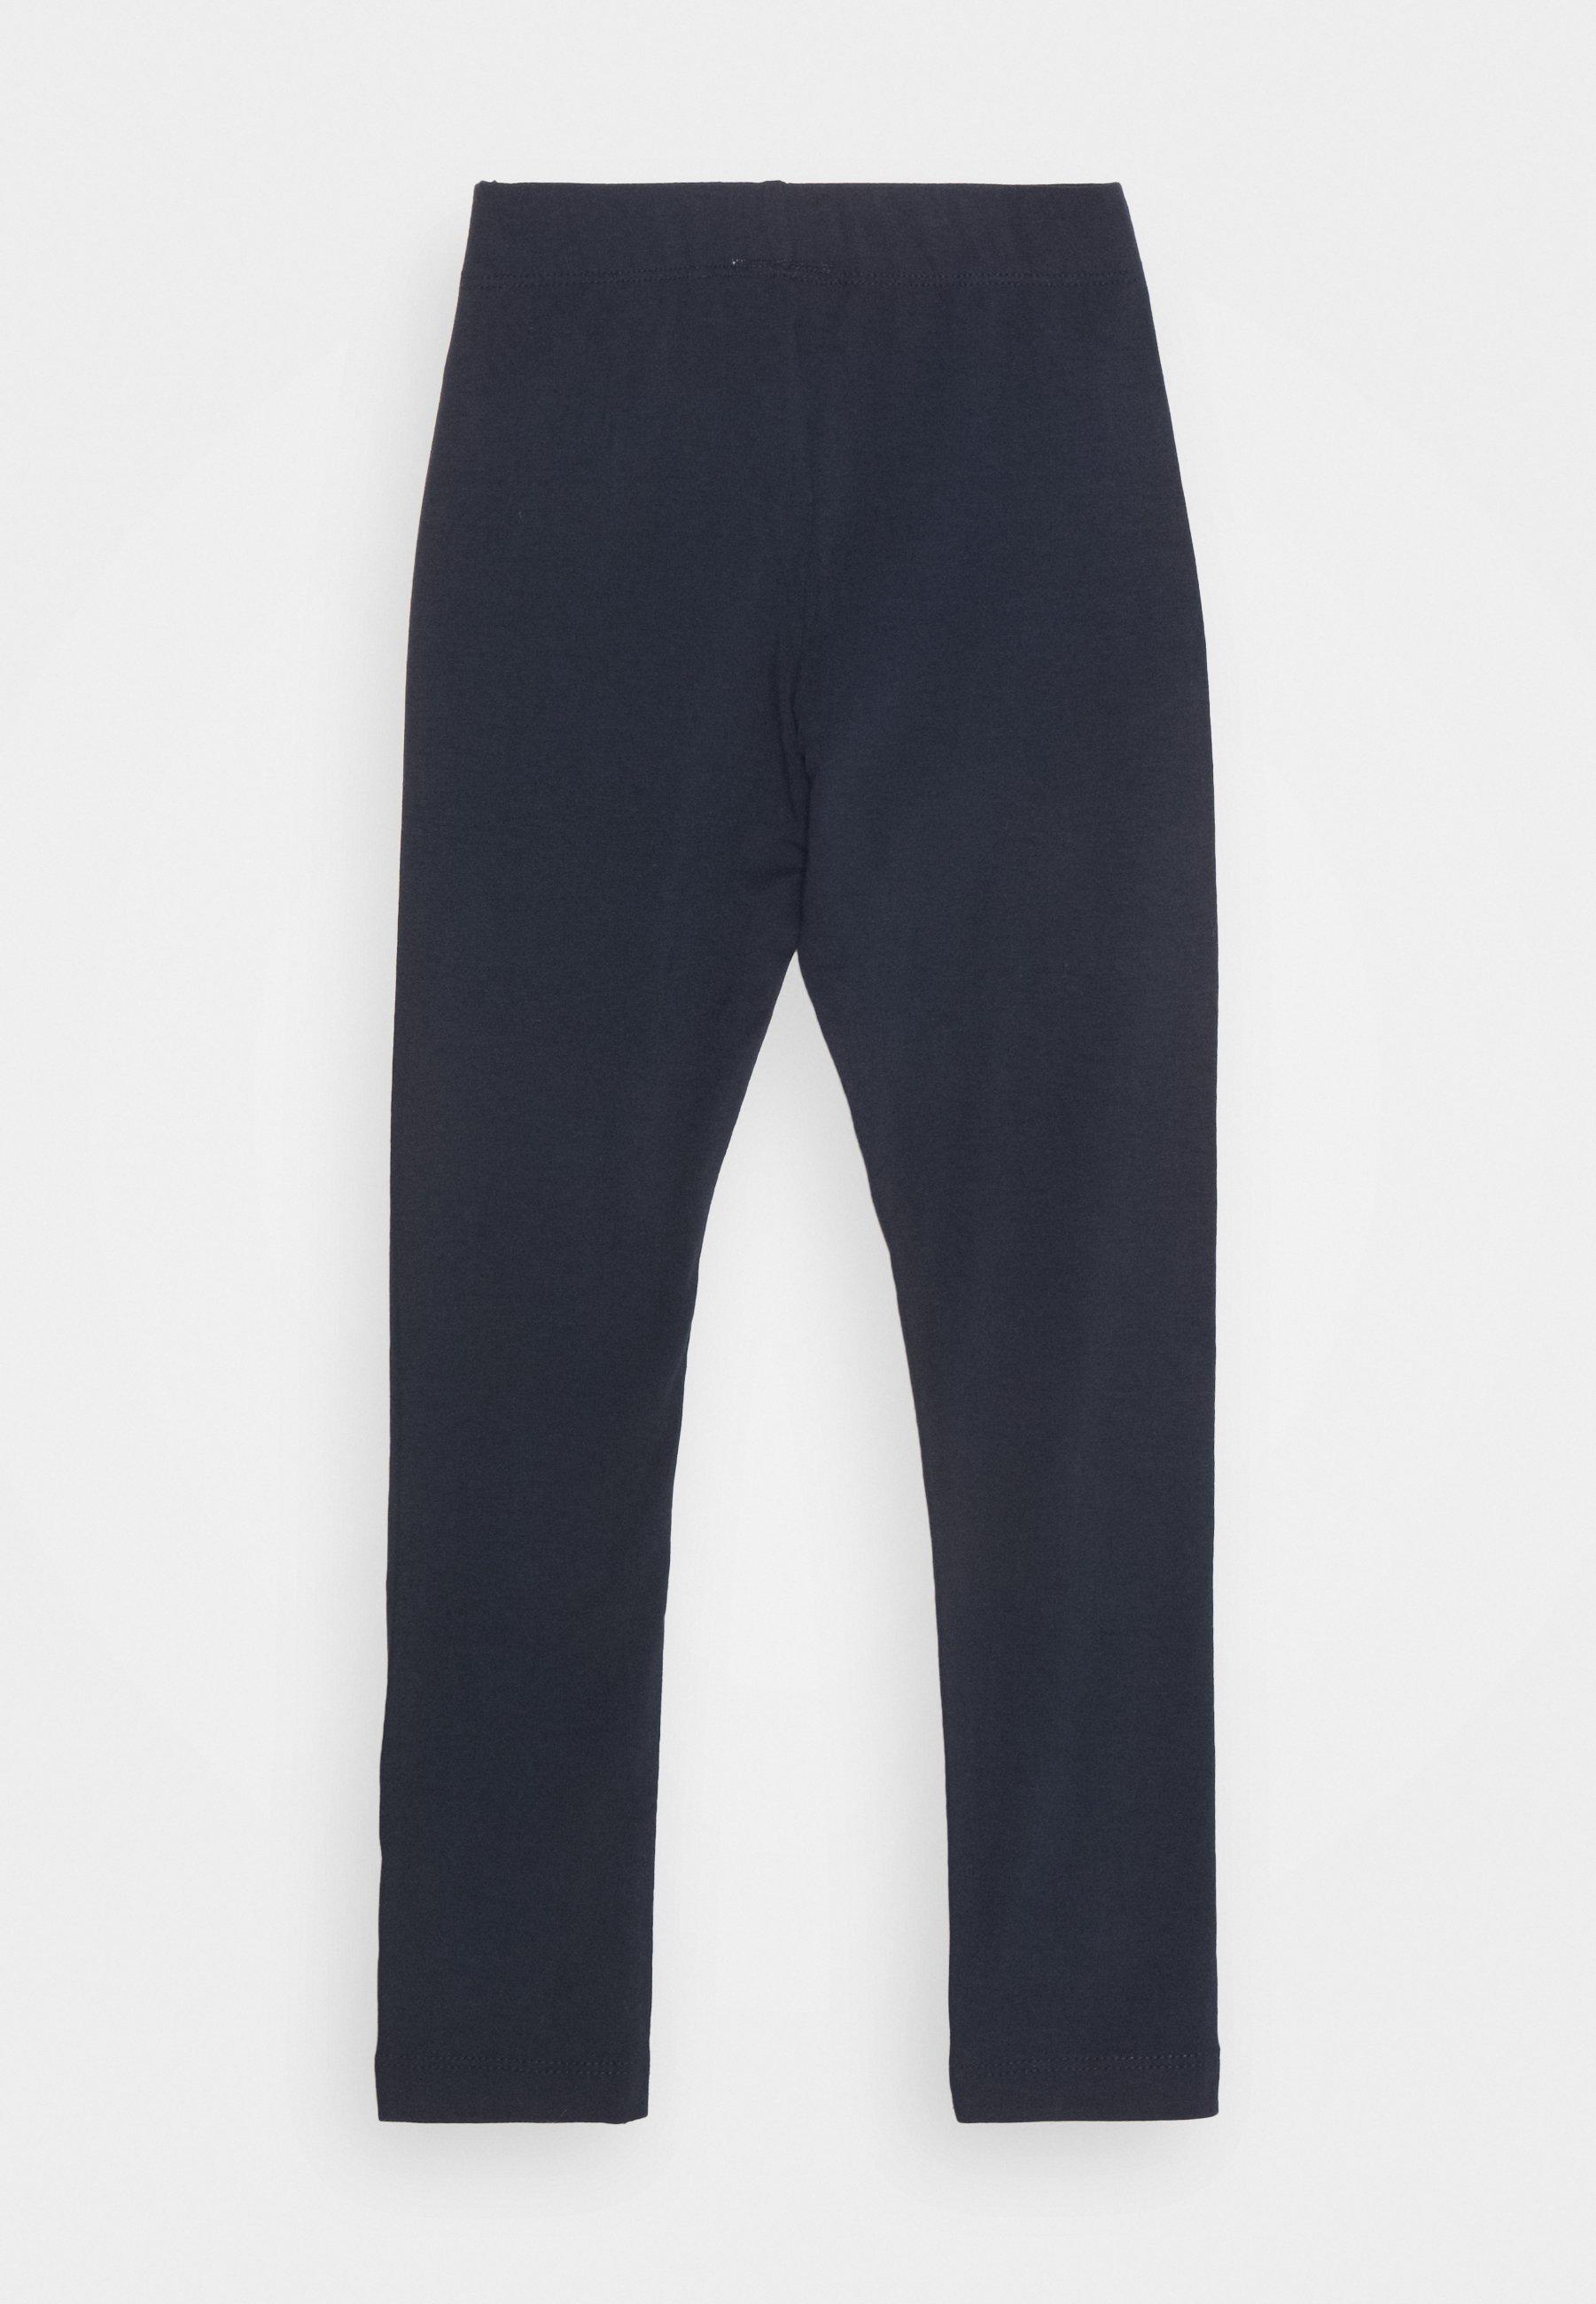 Kids BASIC SUSTAINABLE - Leggings - Trousers